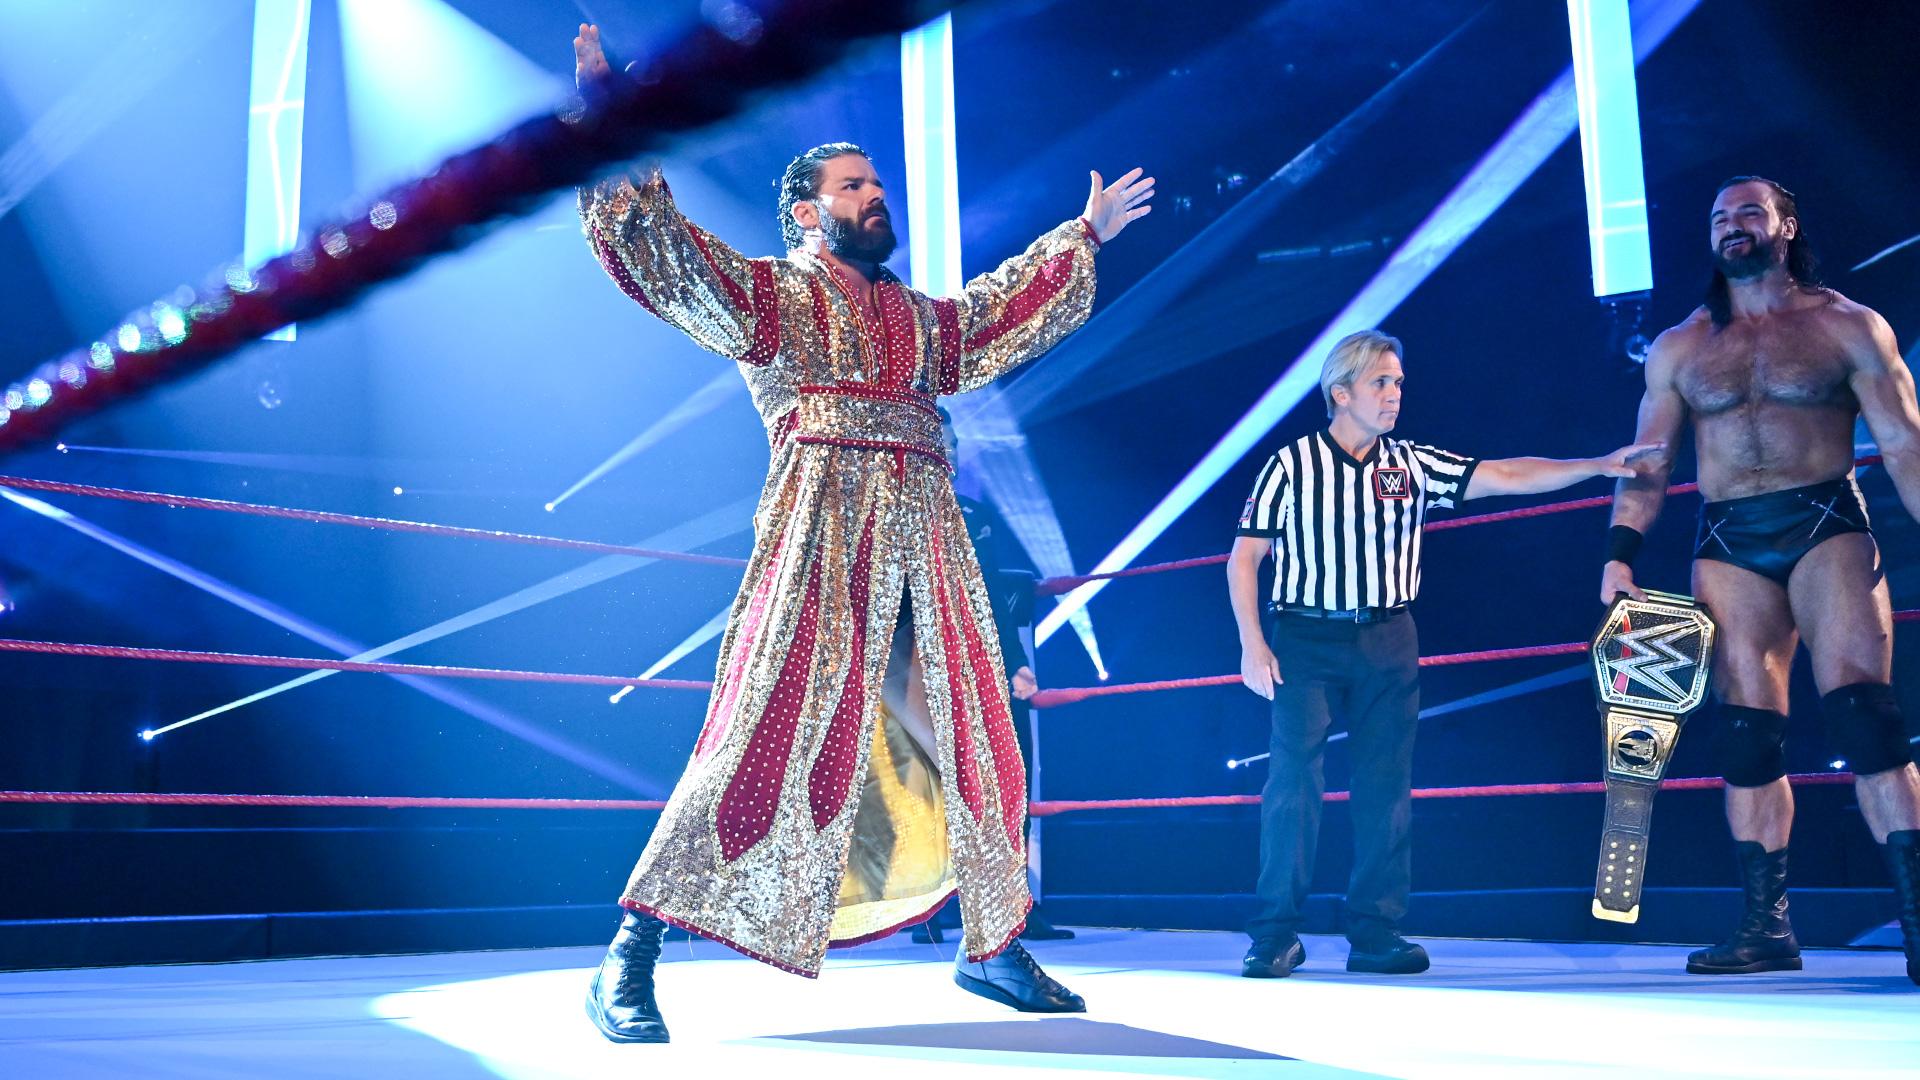 Robert Roode retorna a WWE em grande combate contra Drew McIntyre